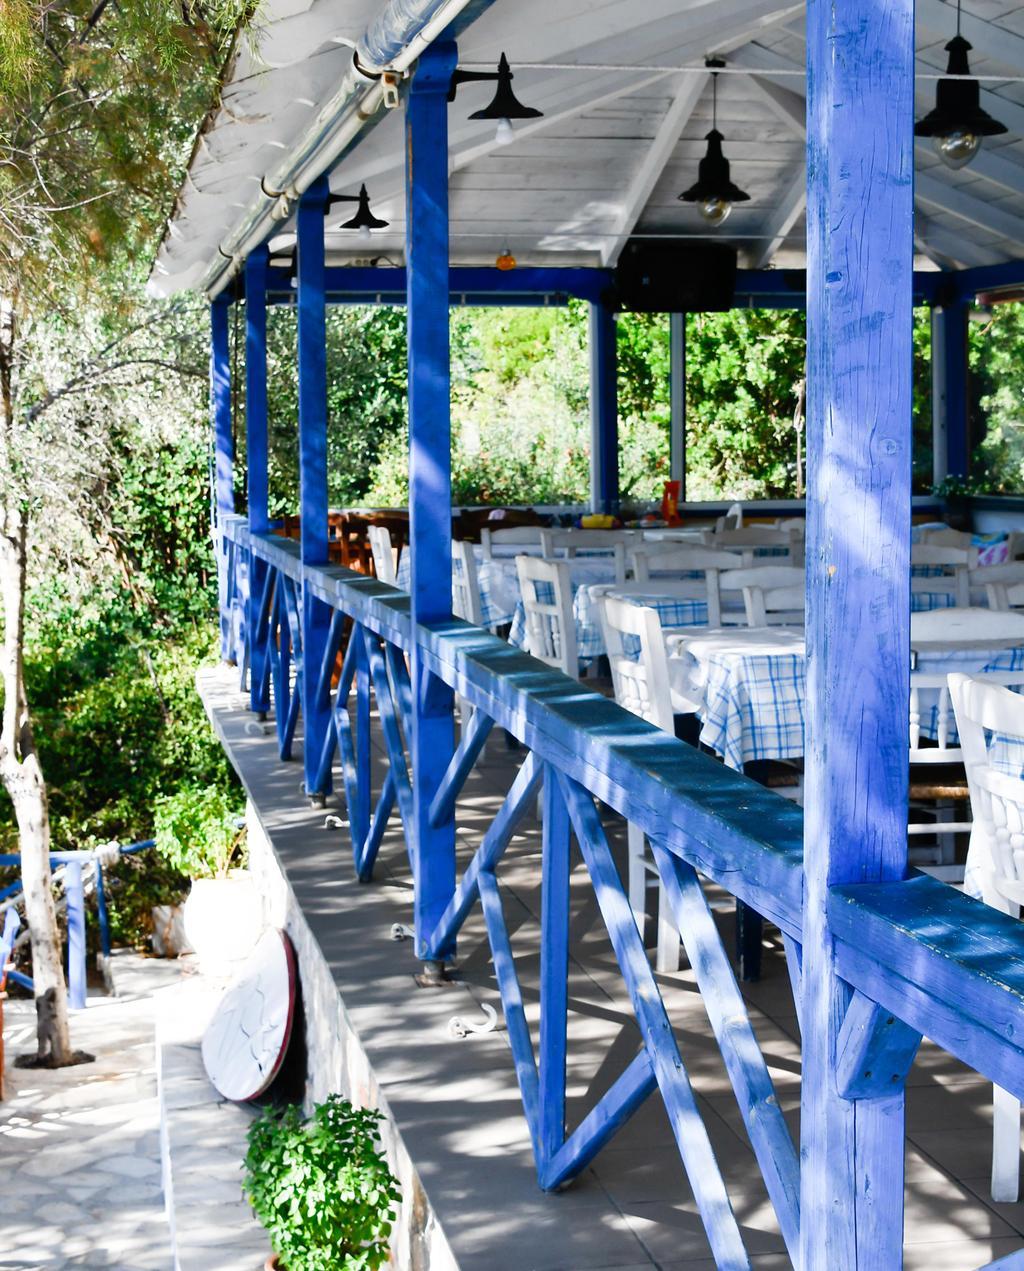 vtwonen 1-2020 | Zakynthos Agios Nikolao sport